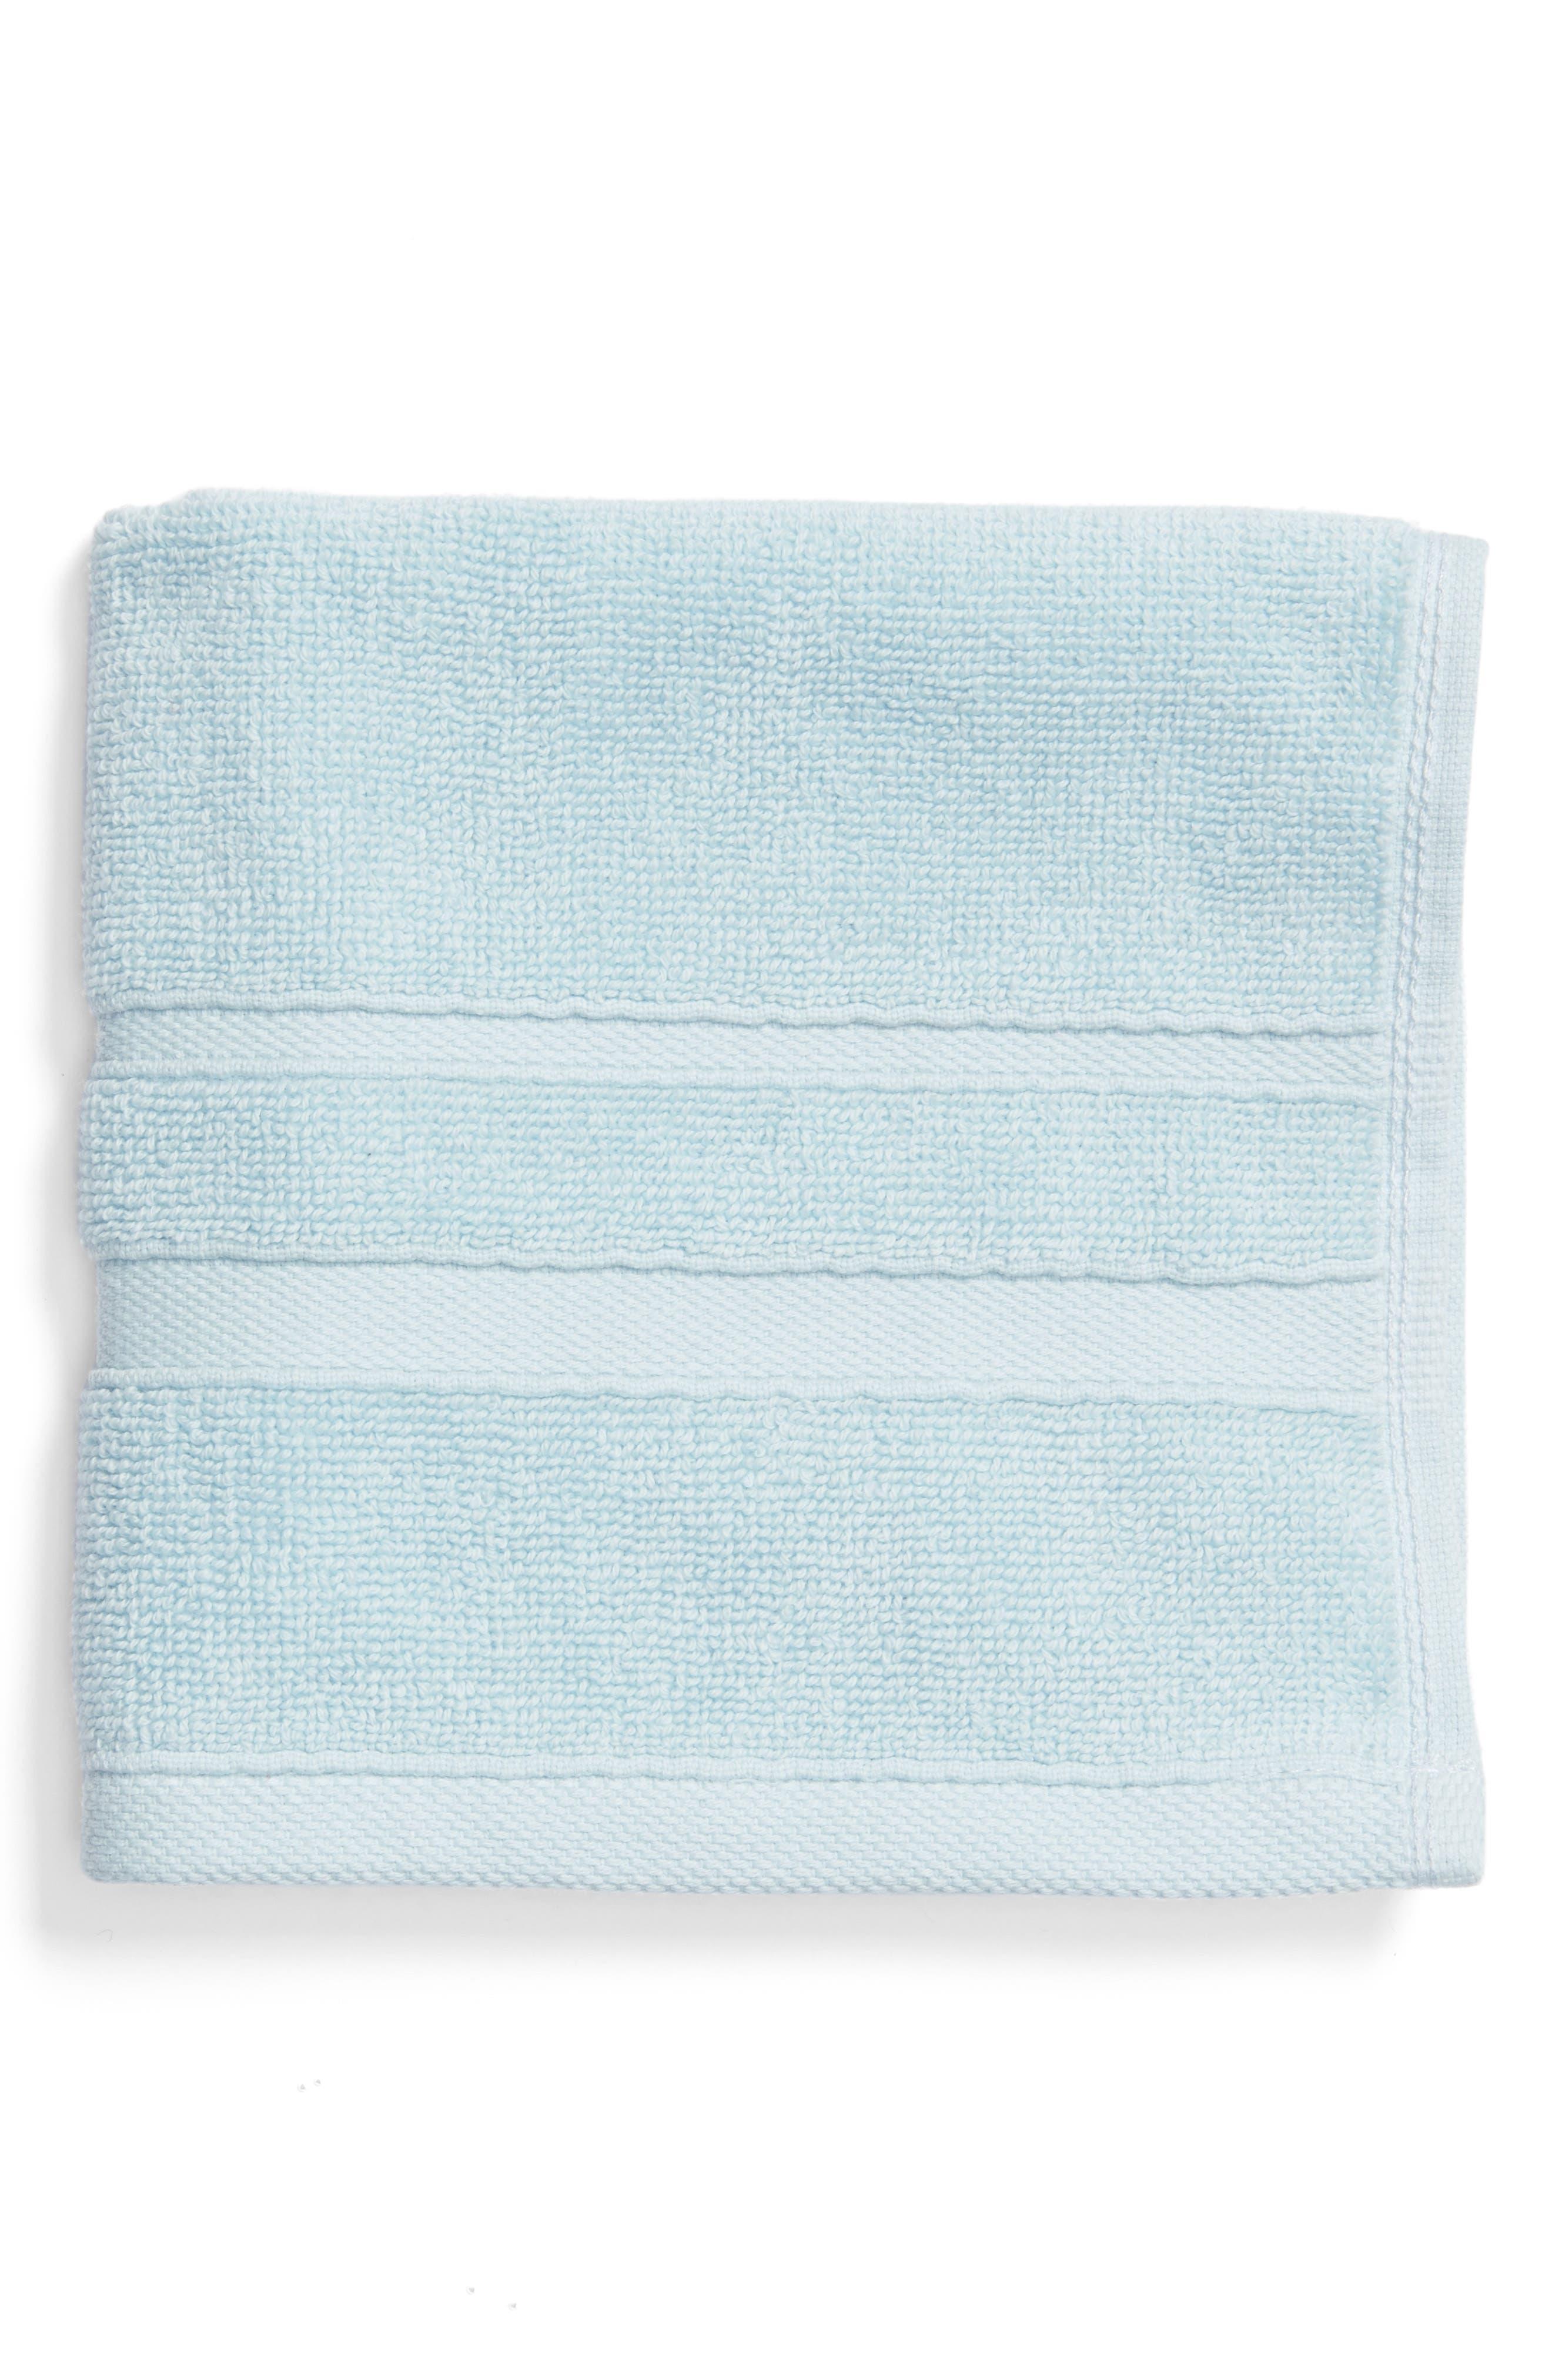 'Perennial' Combed Turkish Cotton Washcloth,                             Main thumbnail 1, color,                             CHRYSTAL BLUE